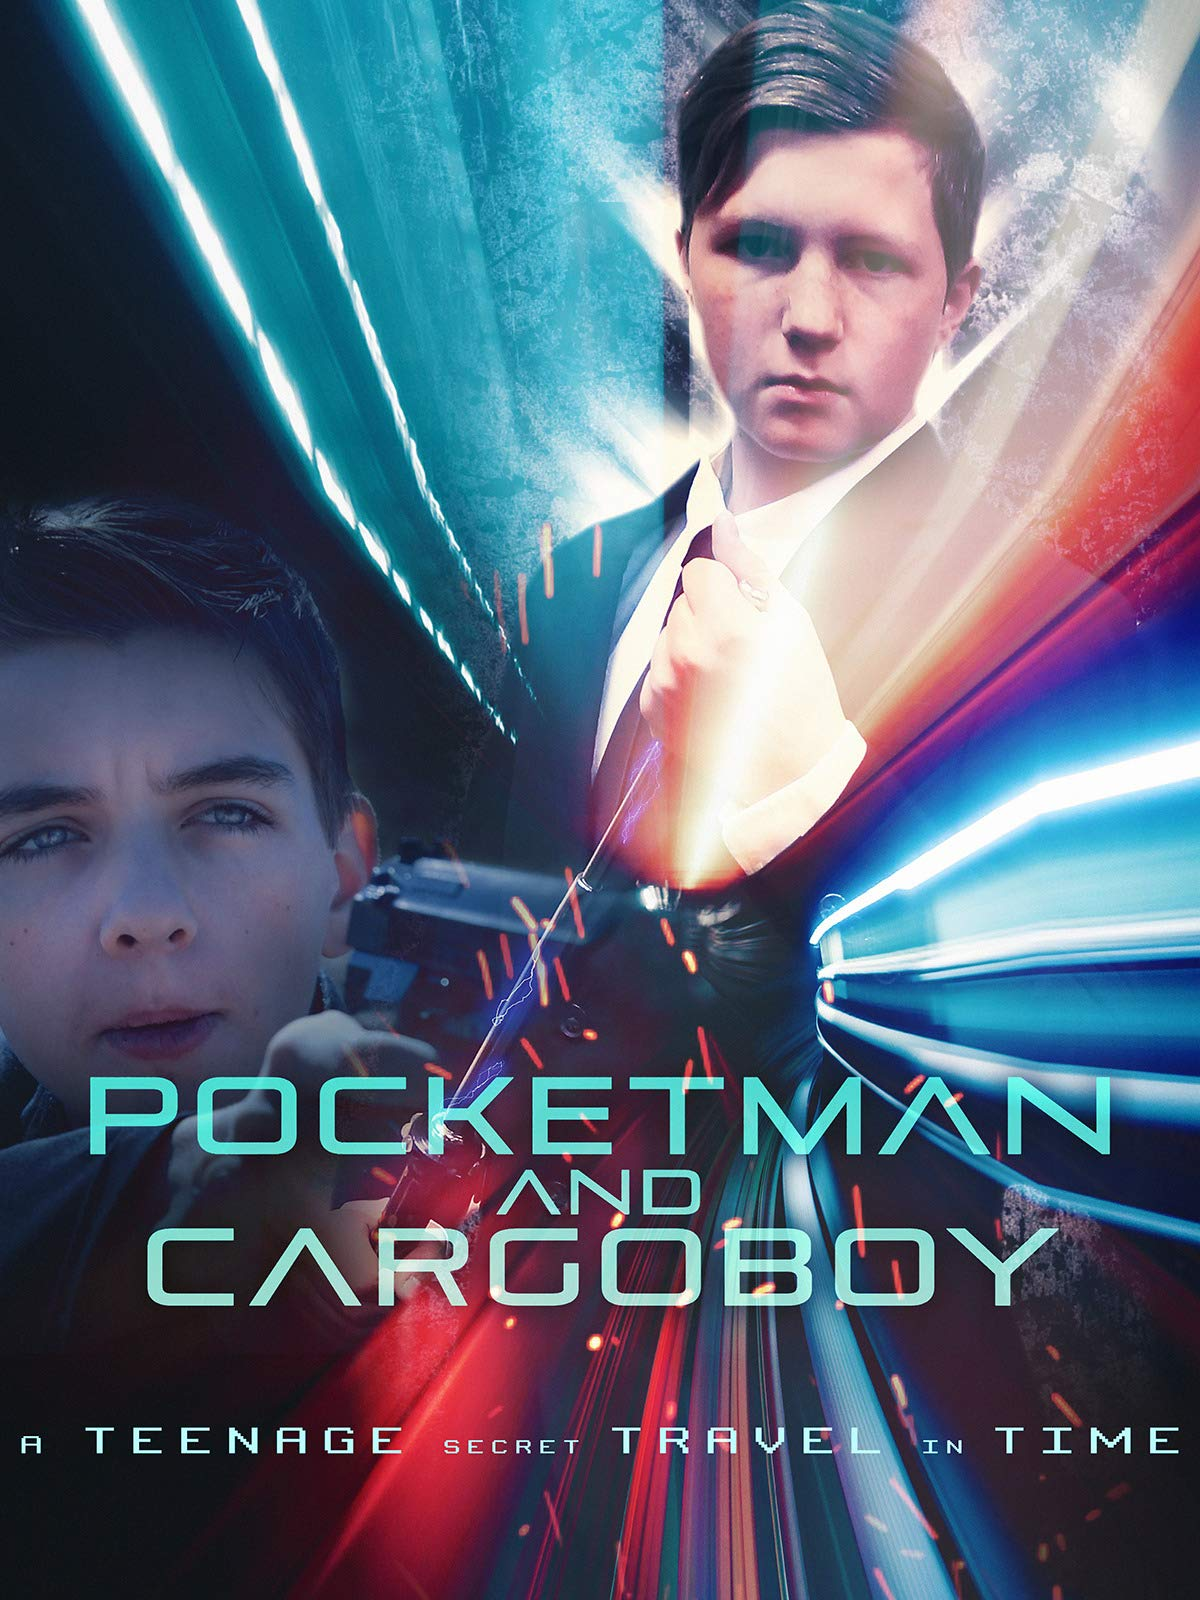 فيلم pocketman and cargoboy 2018 مترجم